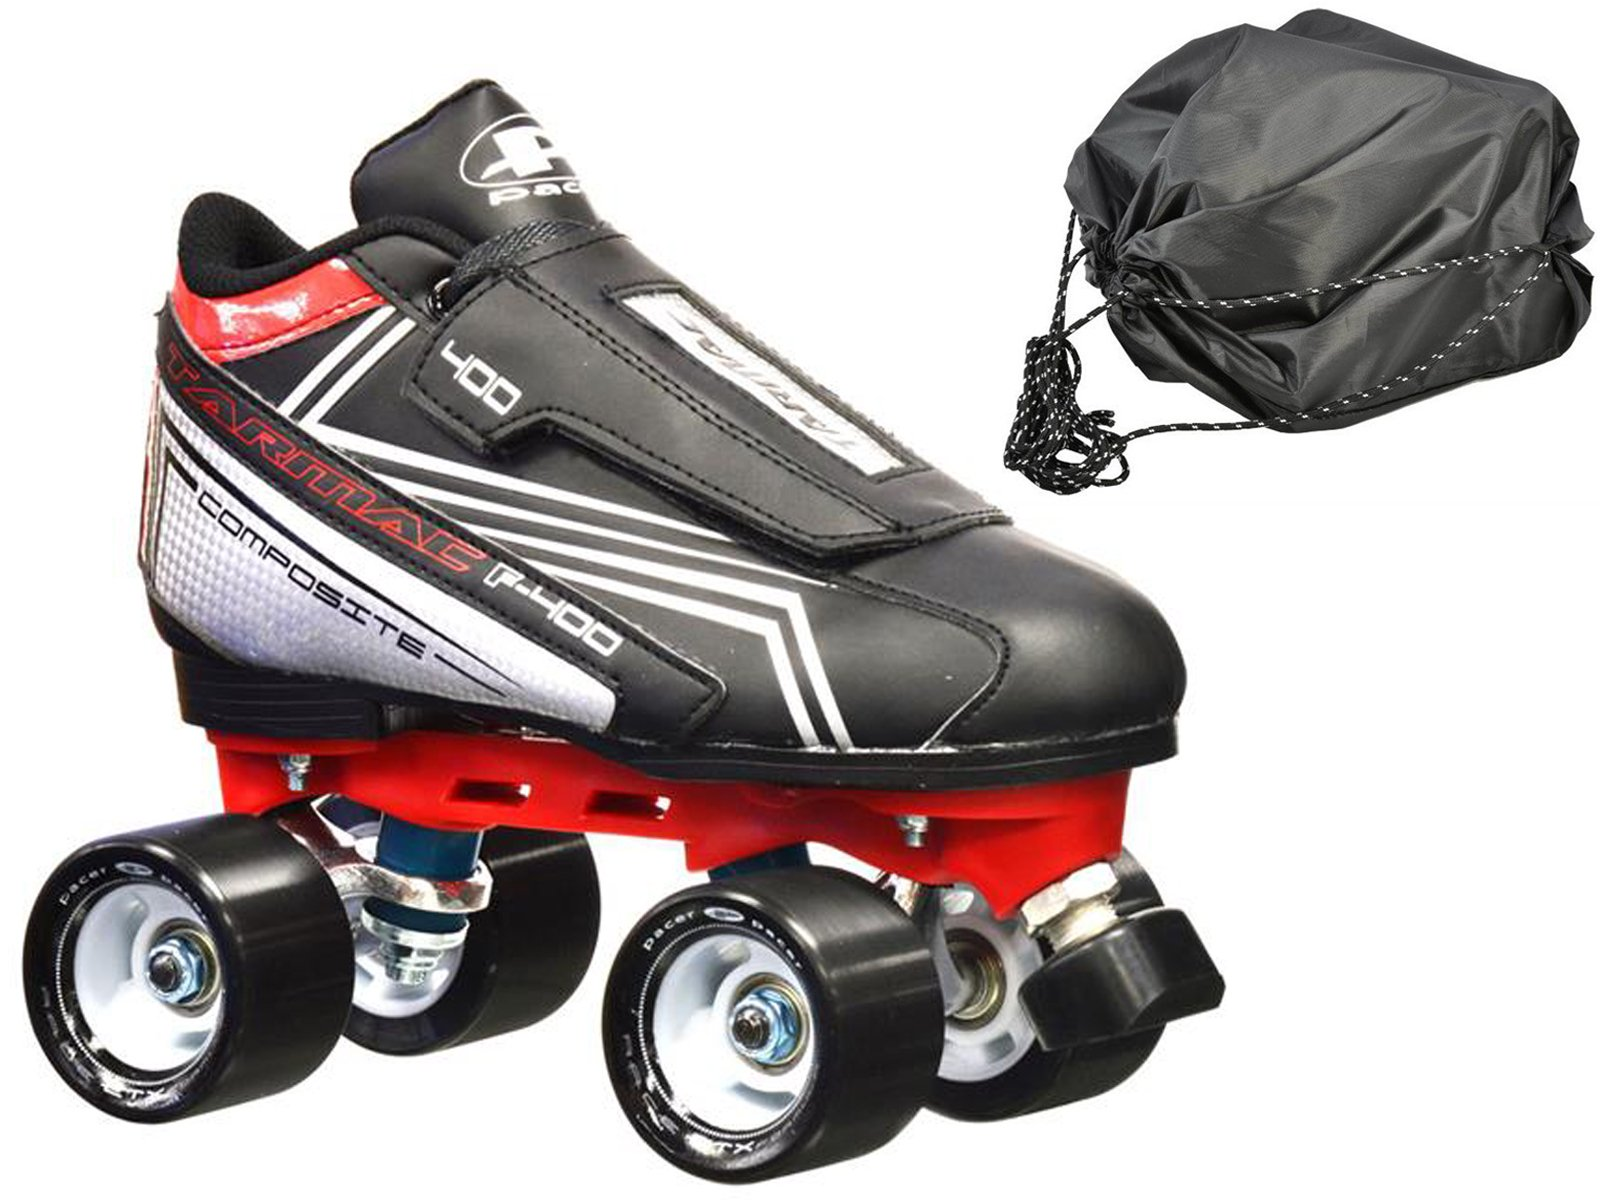 New! Pacer Tarmac F-400 Quad Roller Speed Skates w/ FREE Drawstring bag! (Mens 6)